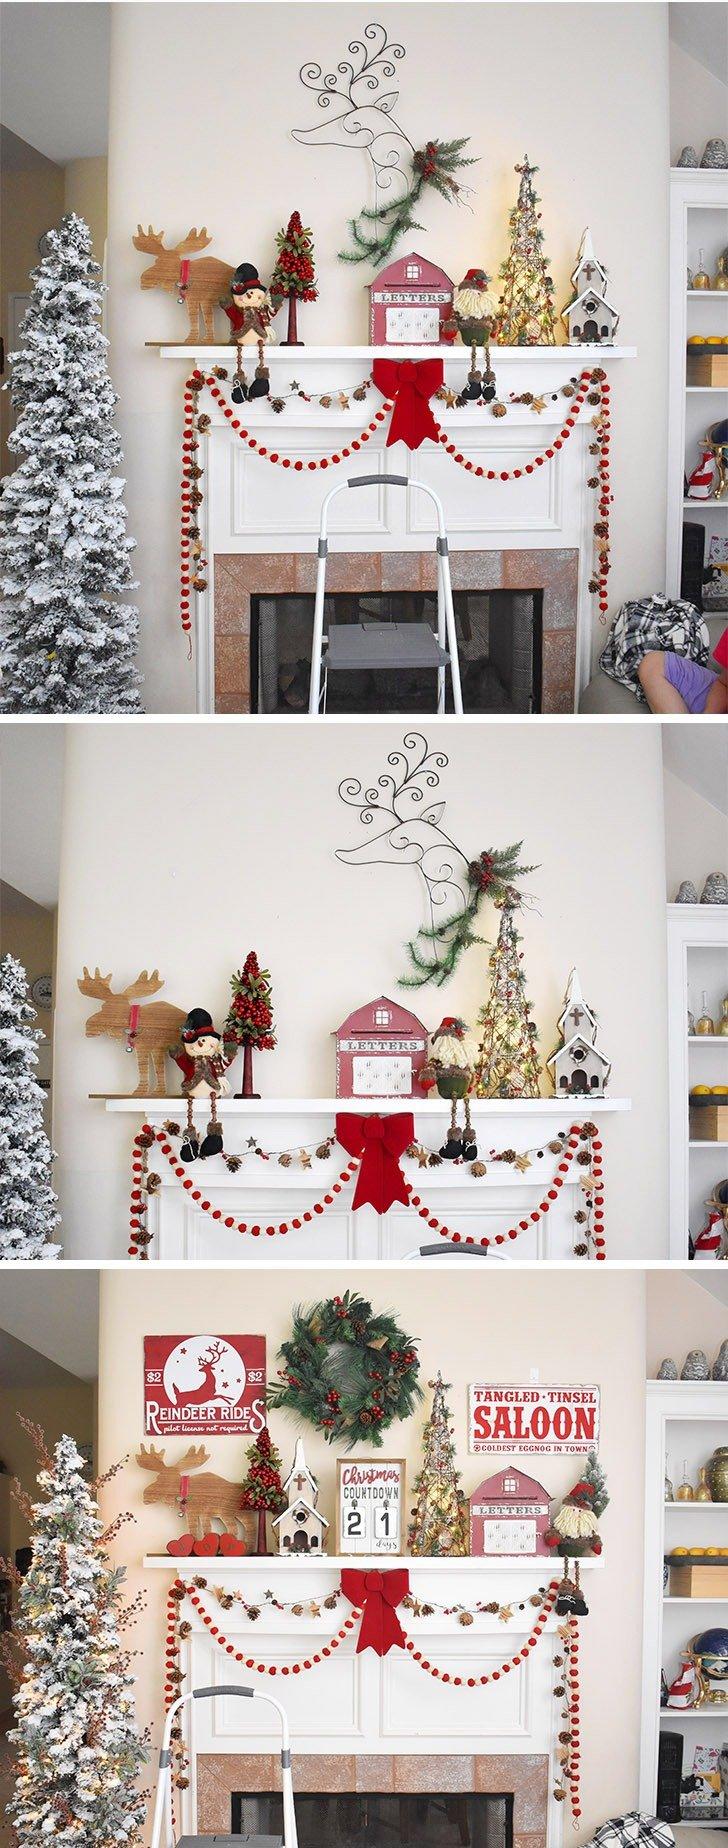 Make And Hang Diy Vintage Christmas Signs Dream A Little Bigger